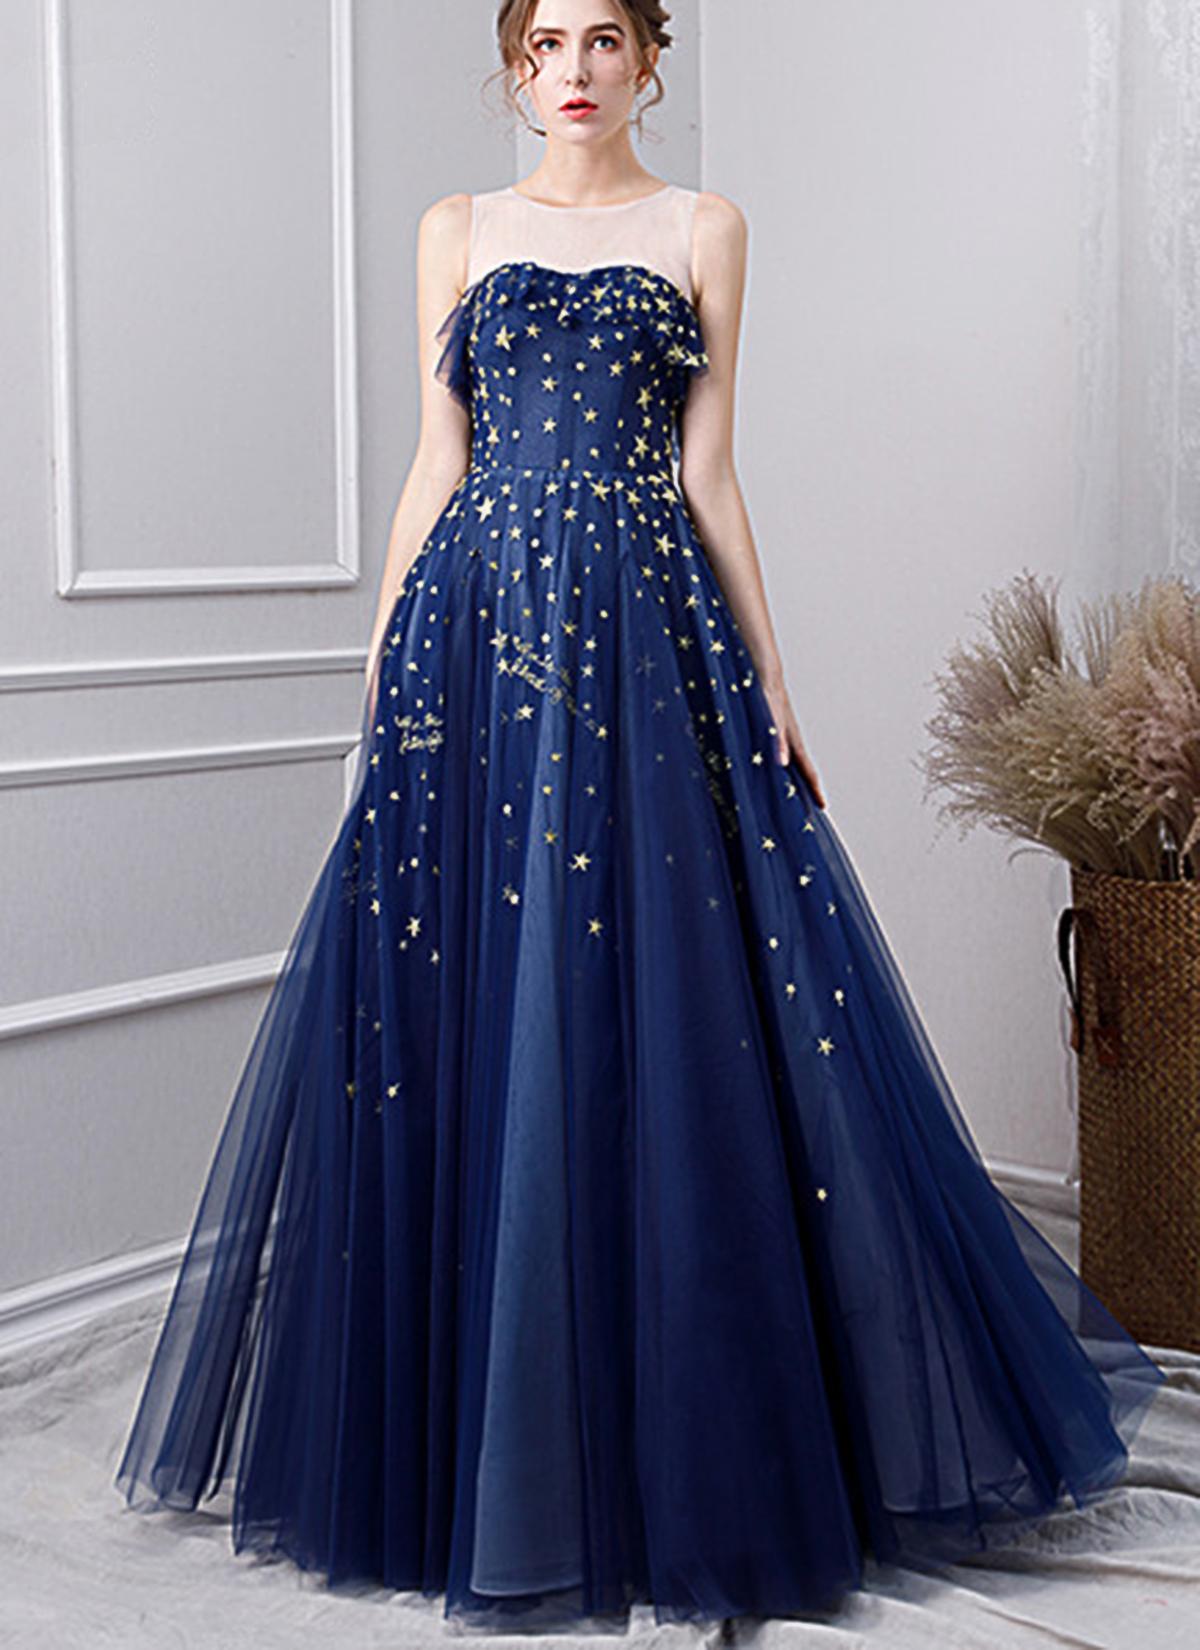 Girls Prom Dresses Blue